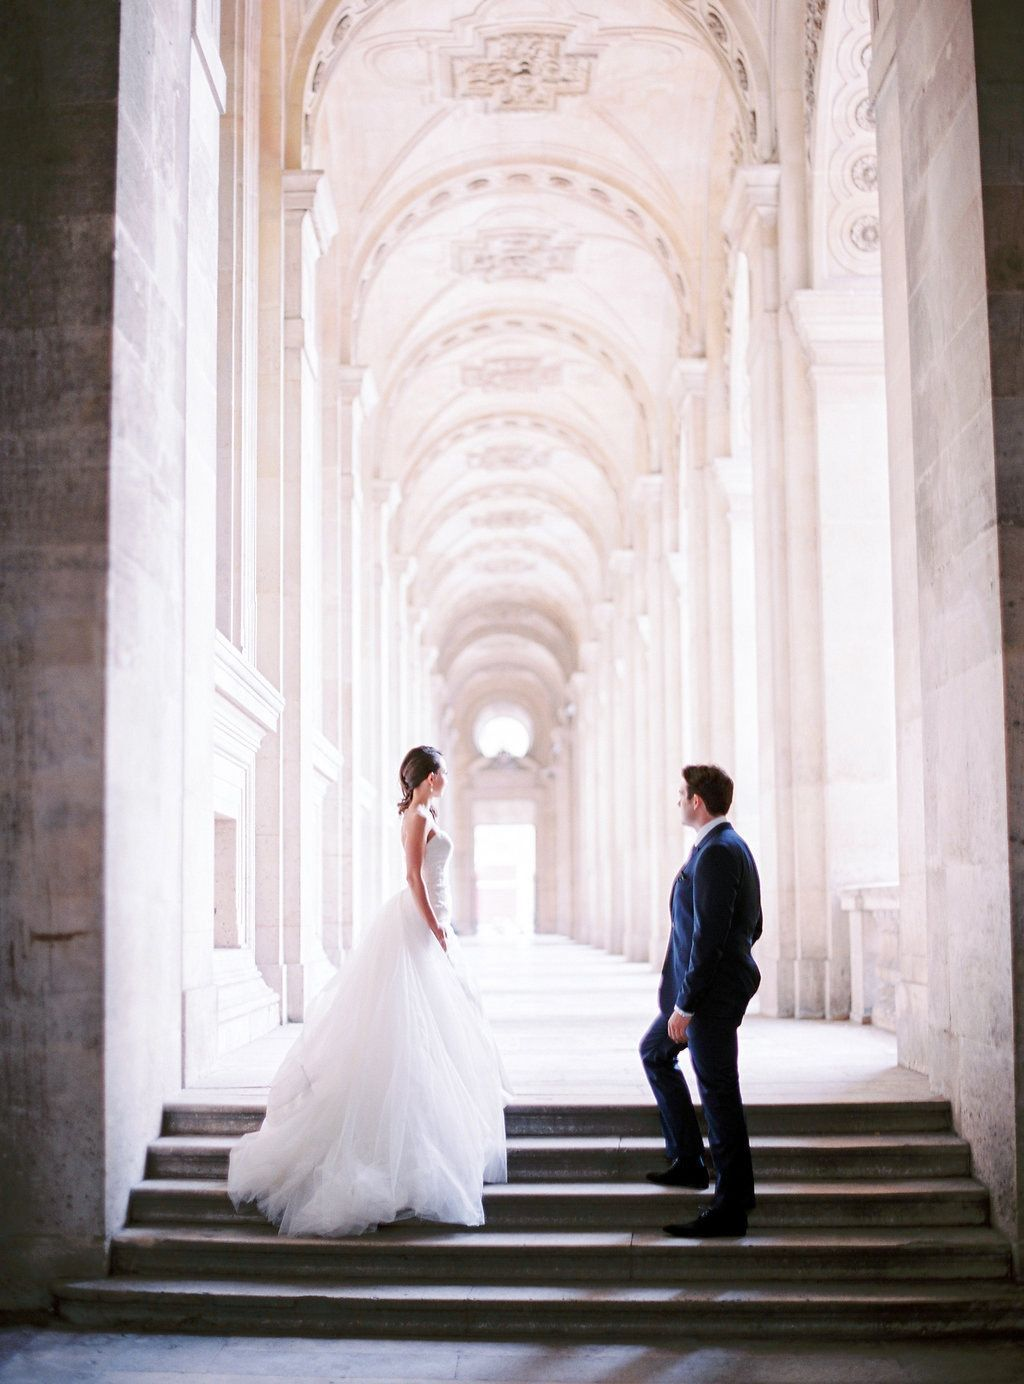 20 Best Paris Wedding Photos - Wedding Photography